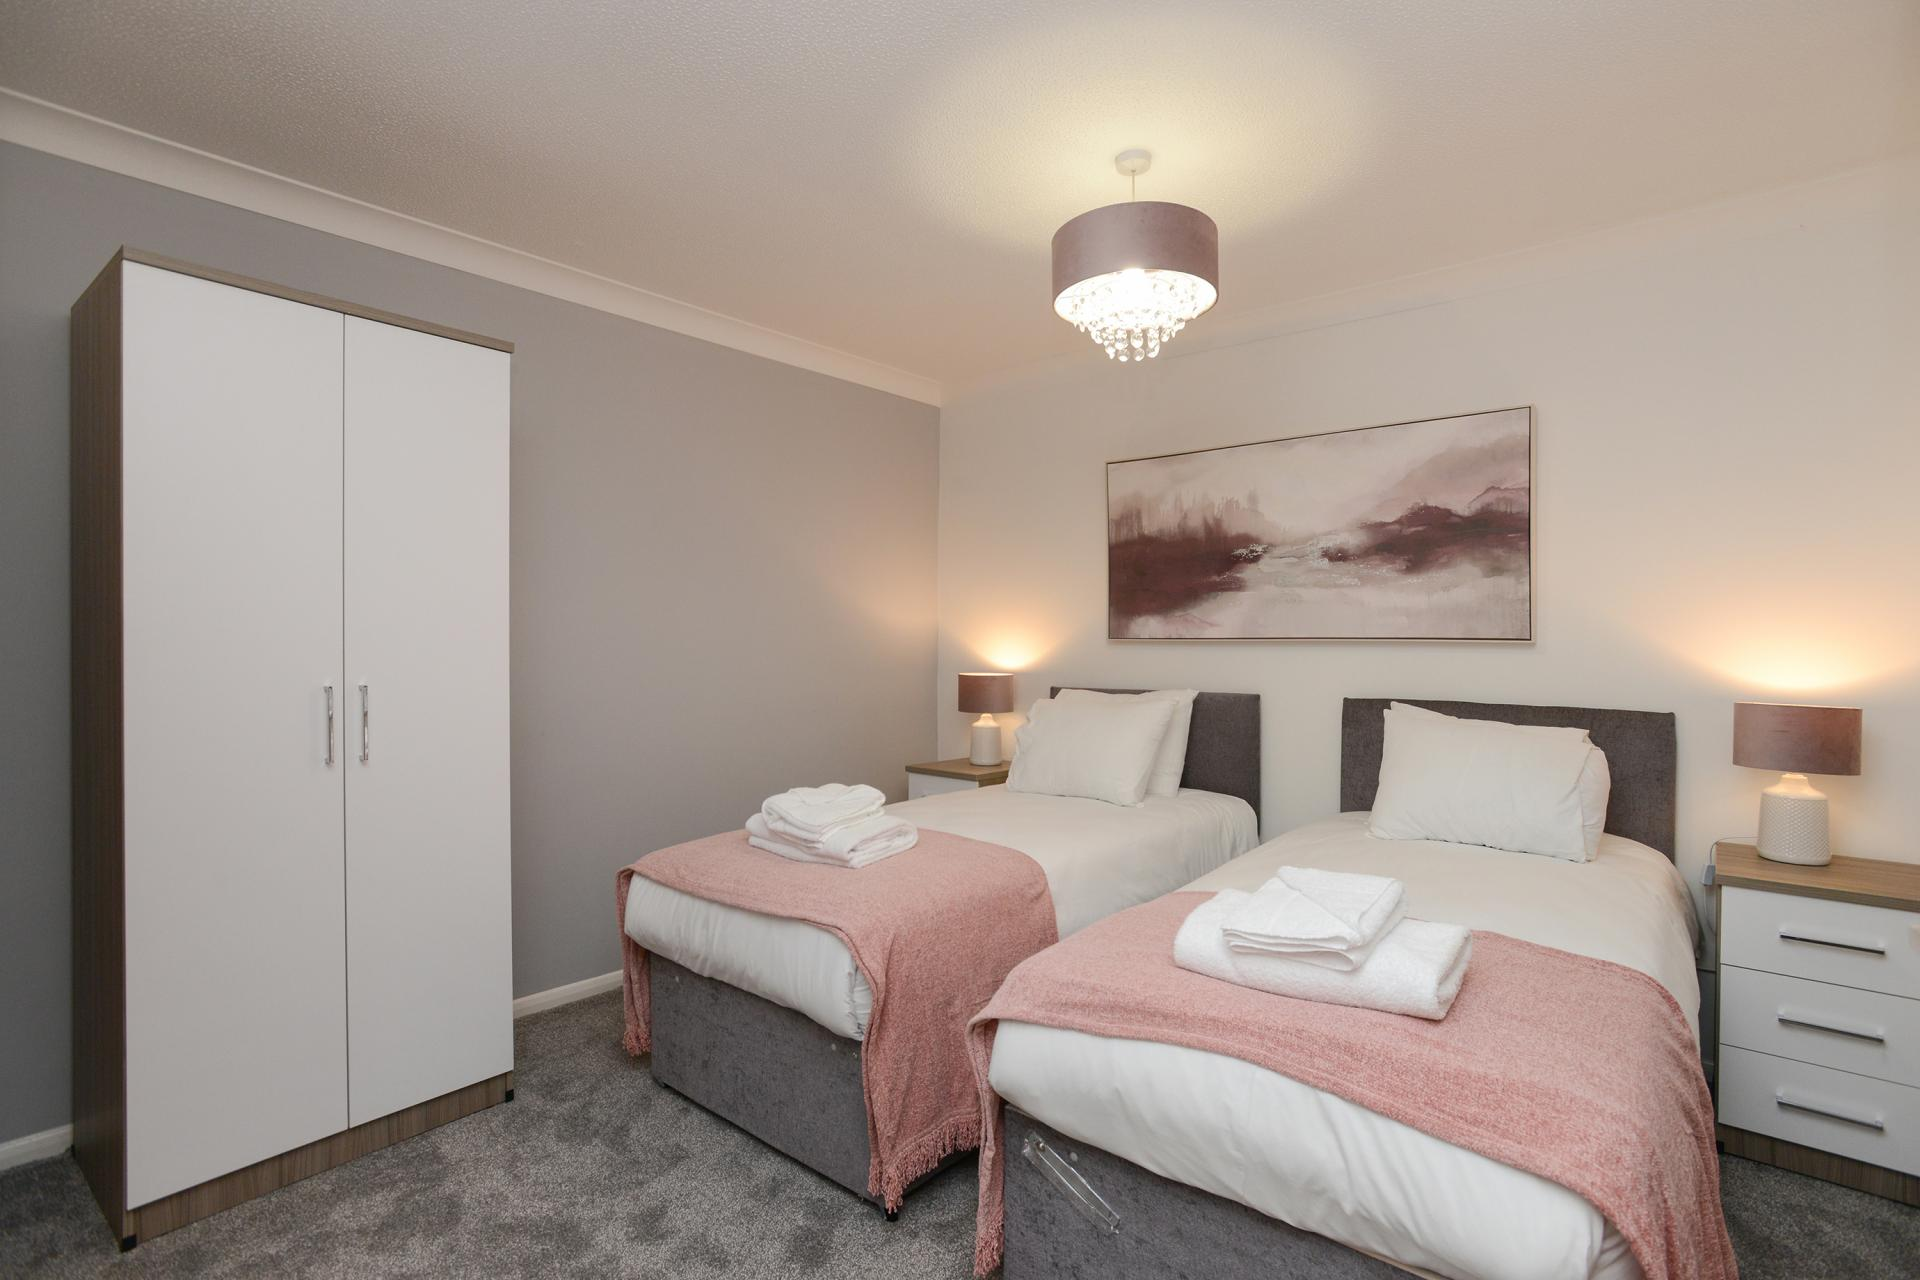 Beds at Brook Court Apartment, Radford, Nottingham - Citybase Apartments